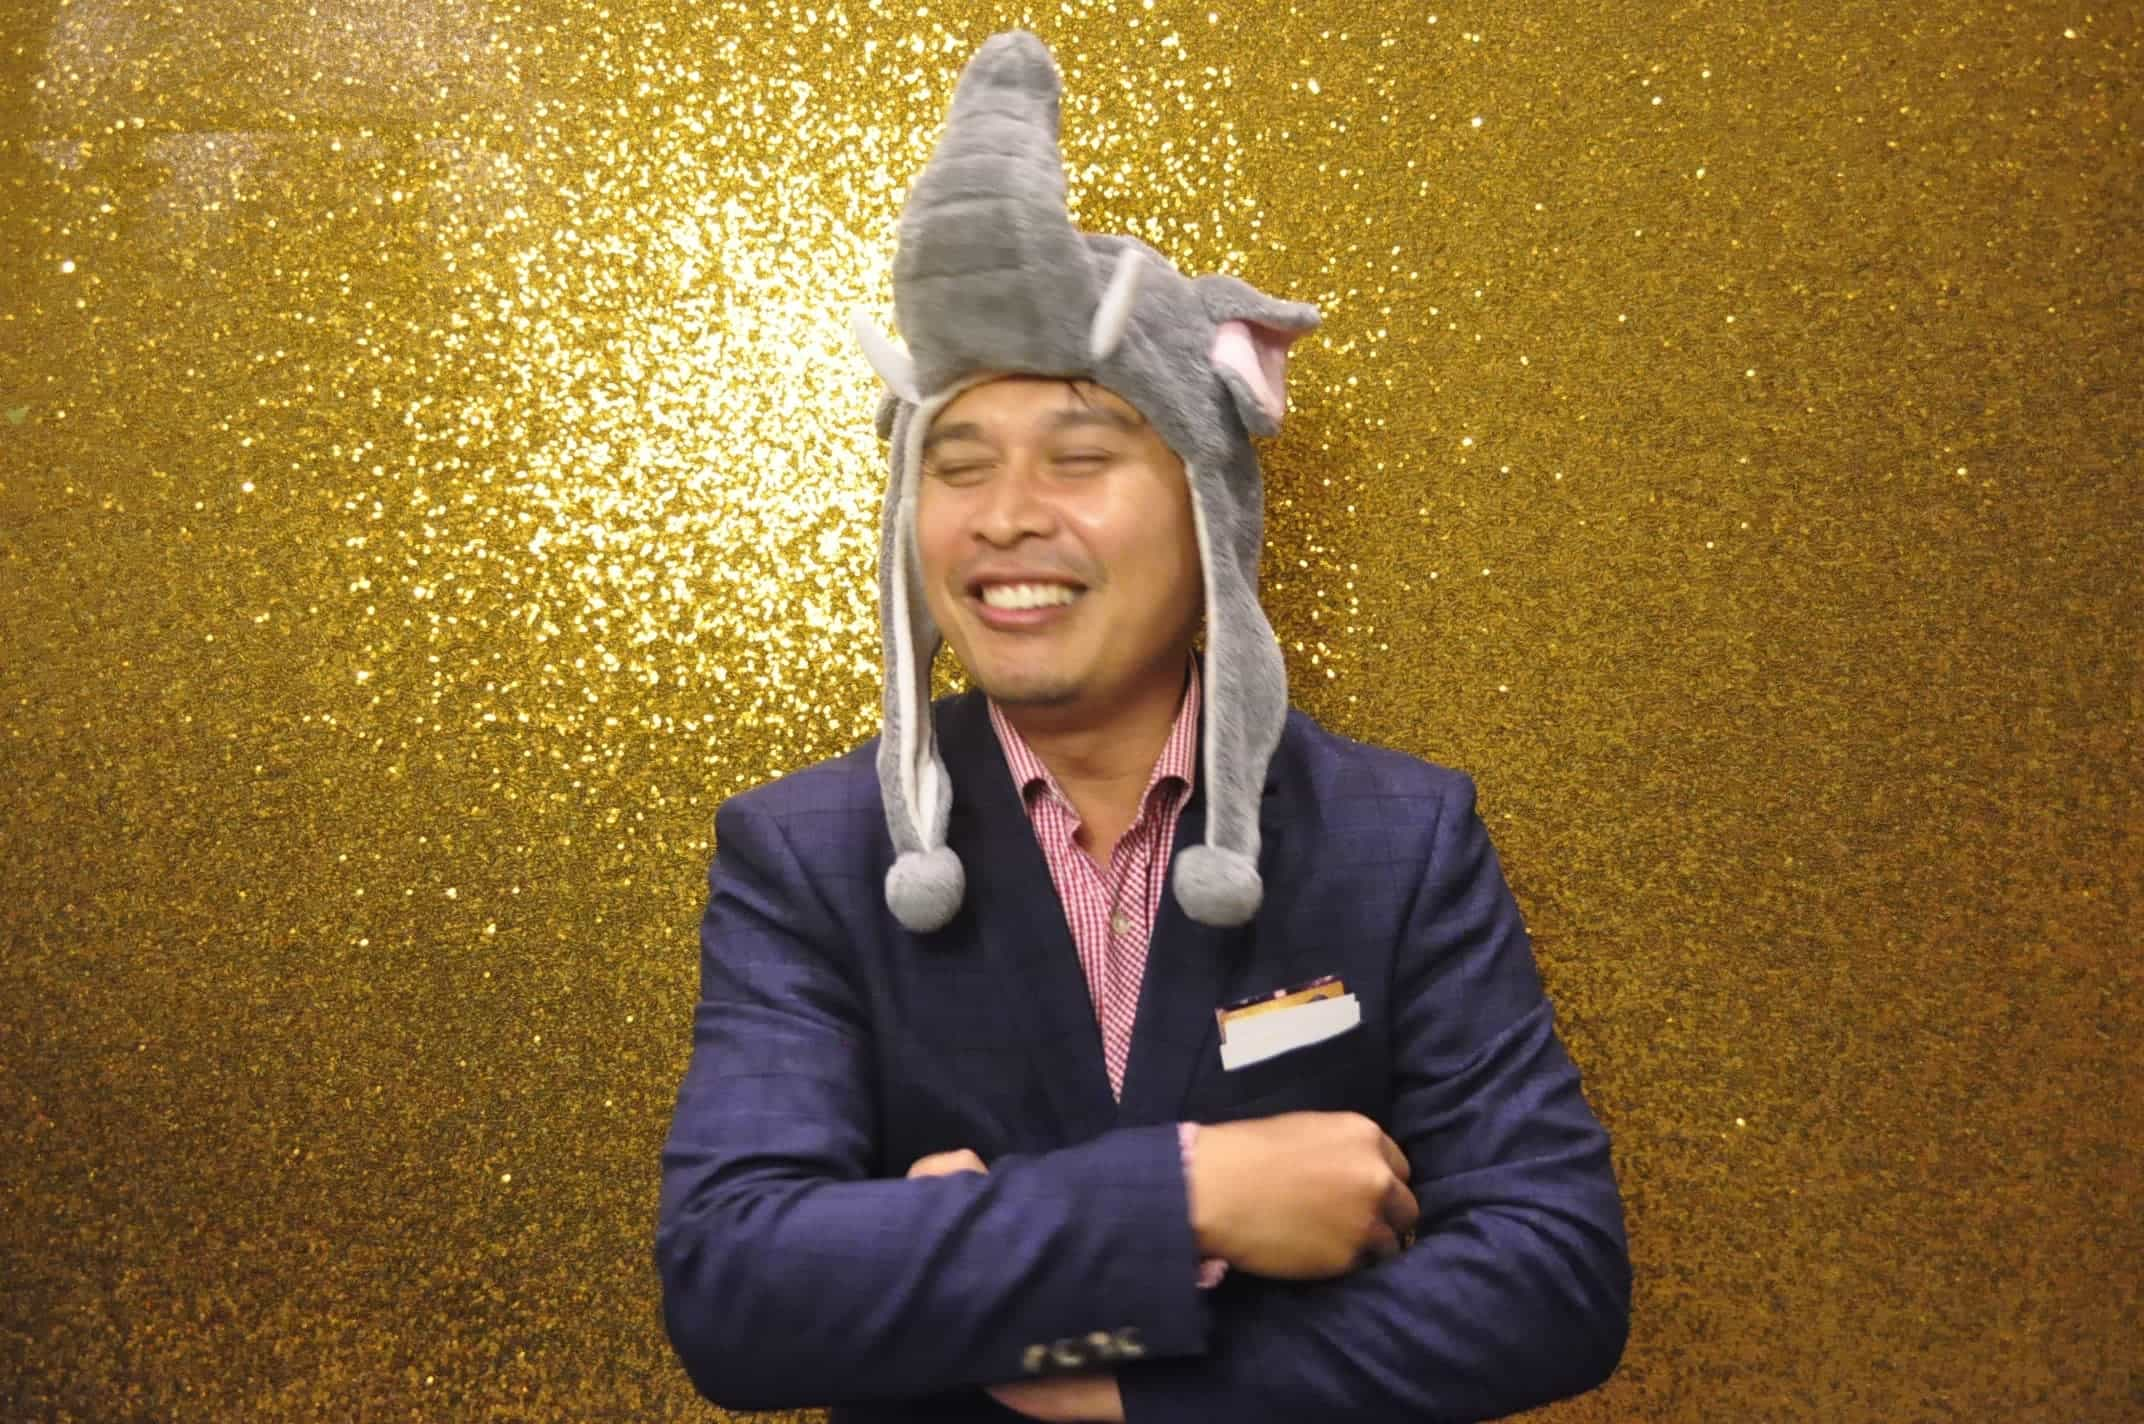 Malam Gala Anggun 2018 (Photobooth) 15